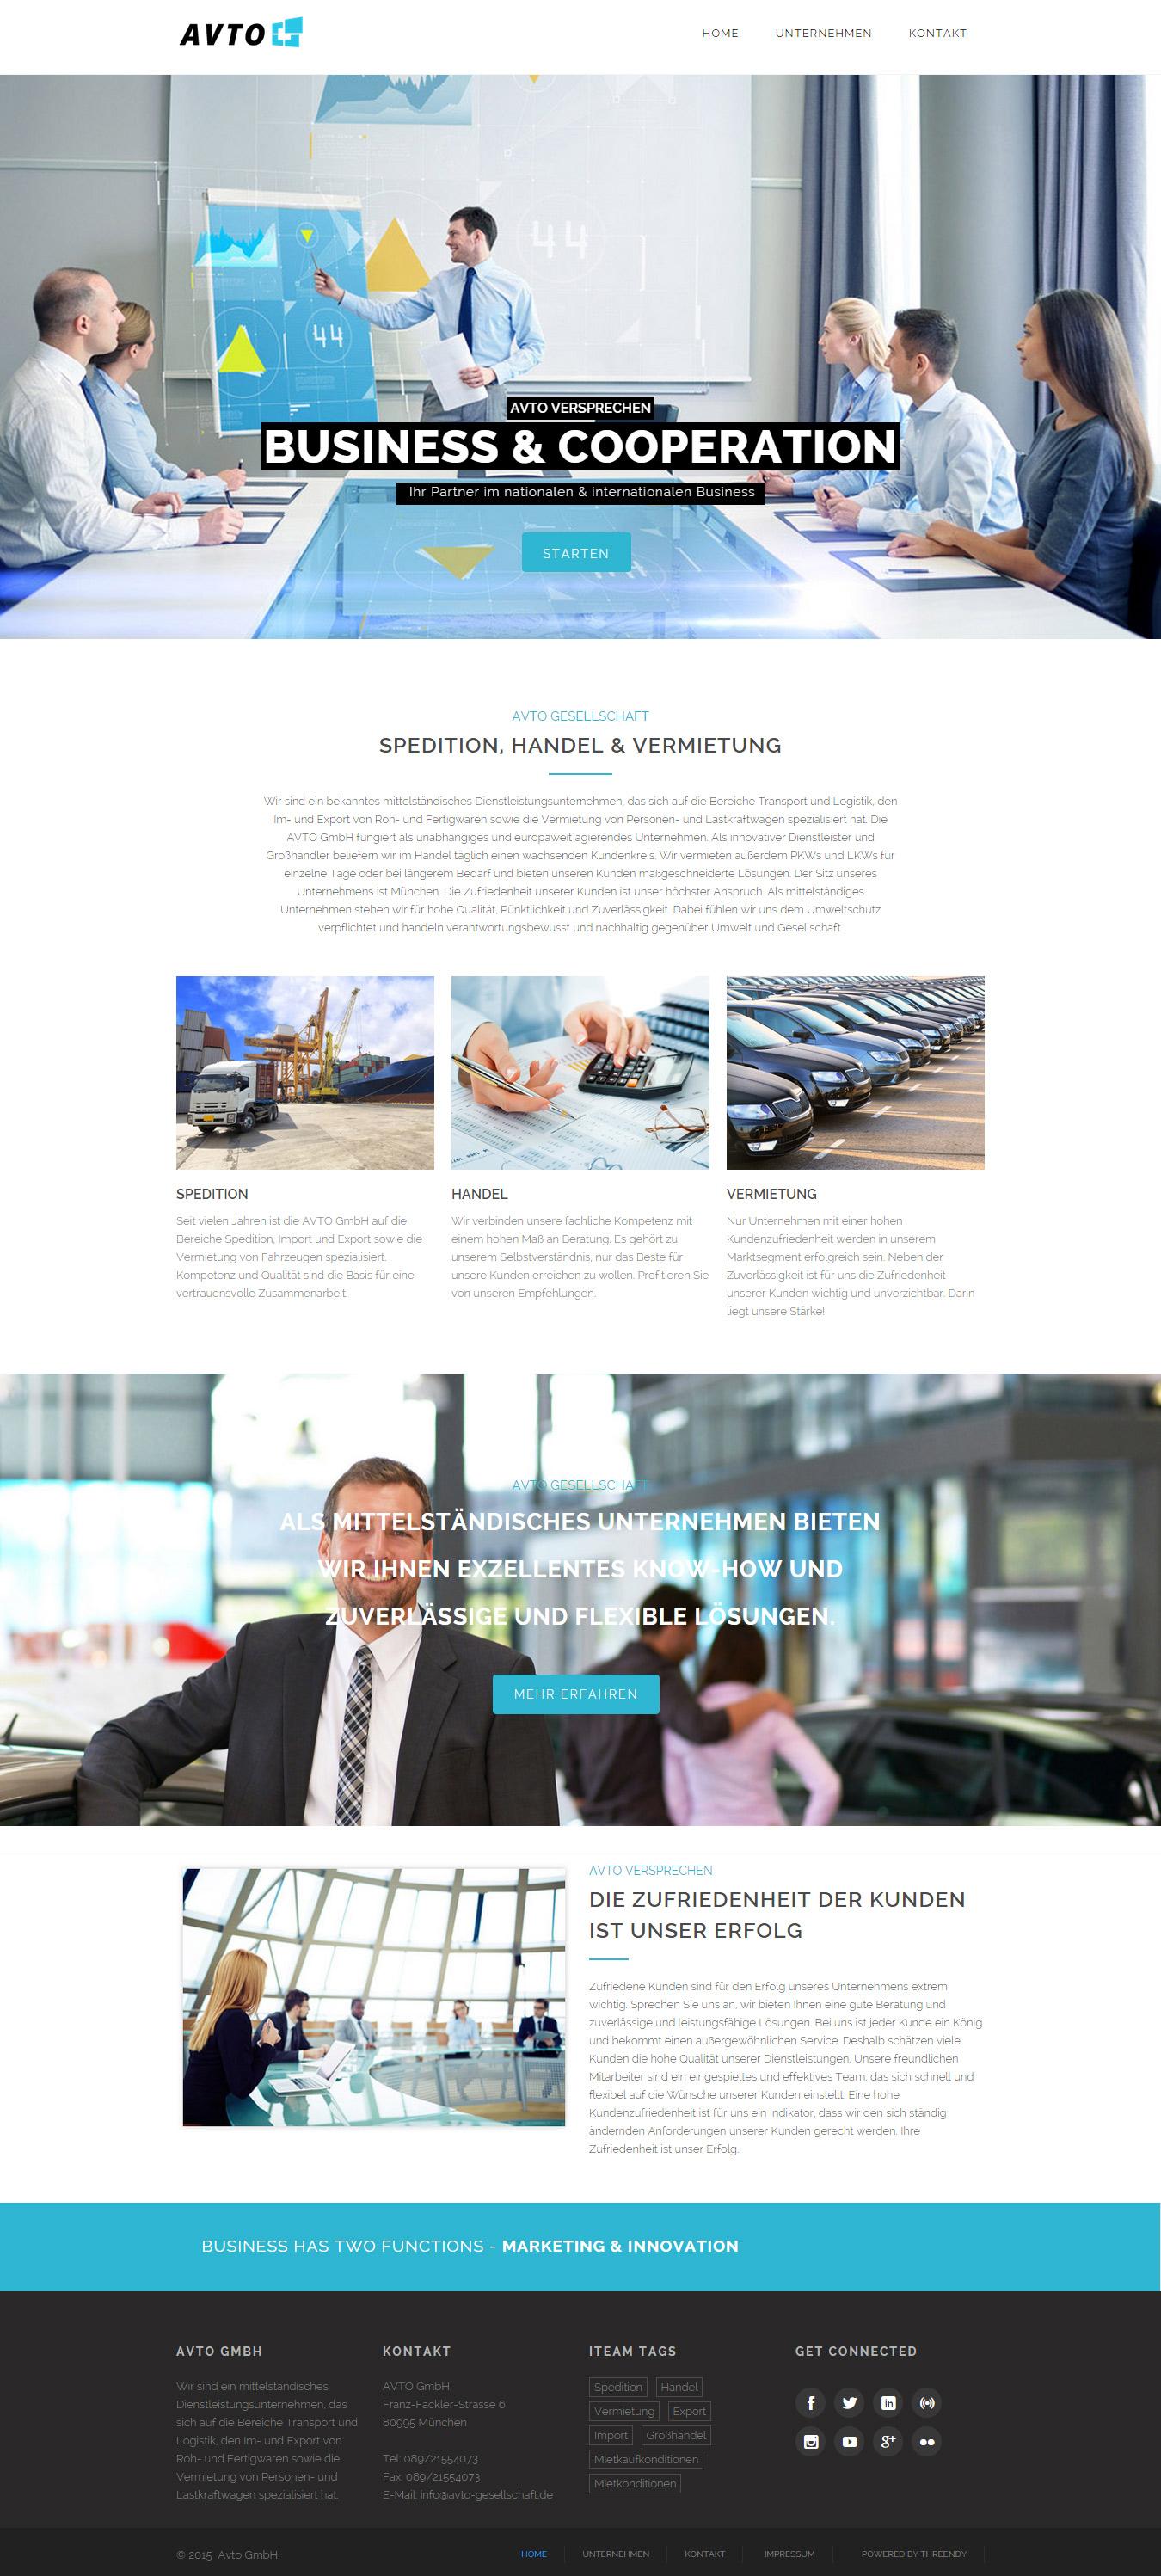 avto-homepage-html